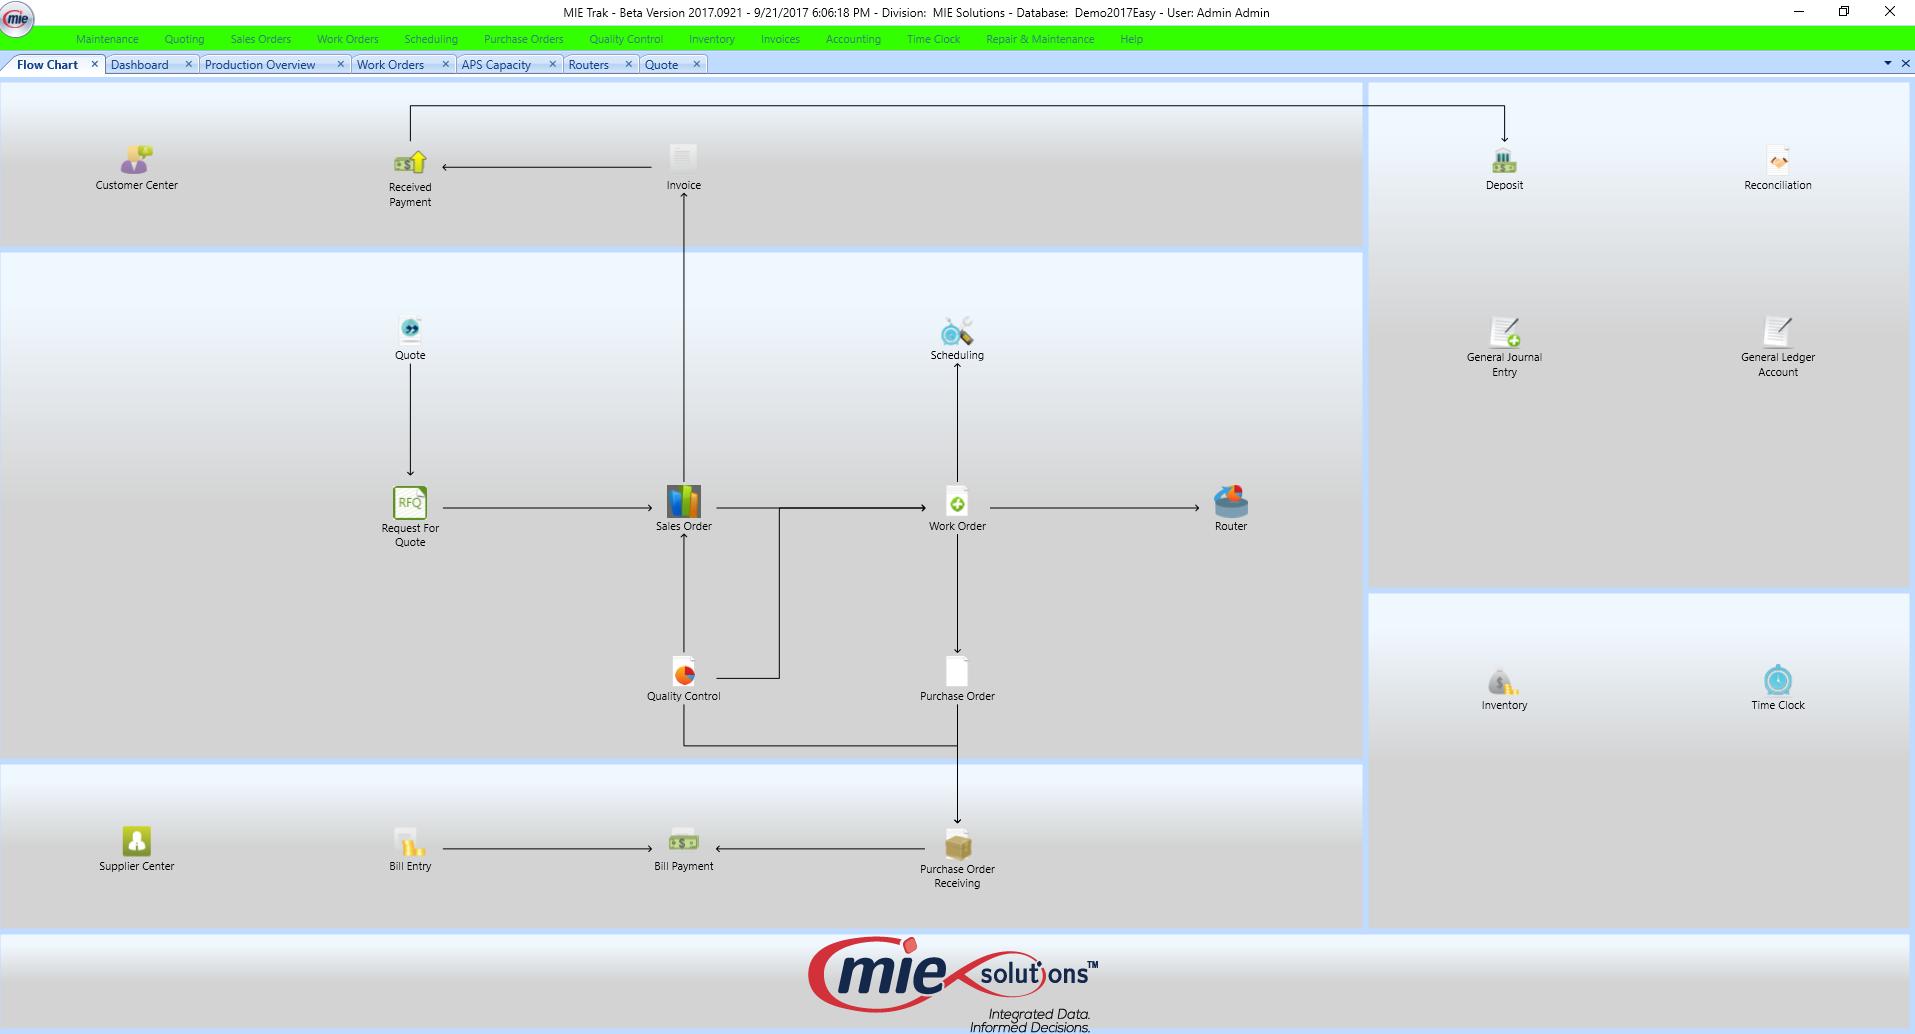 MIE Trak Pro Software - Flow chart